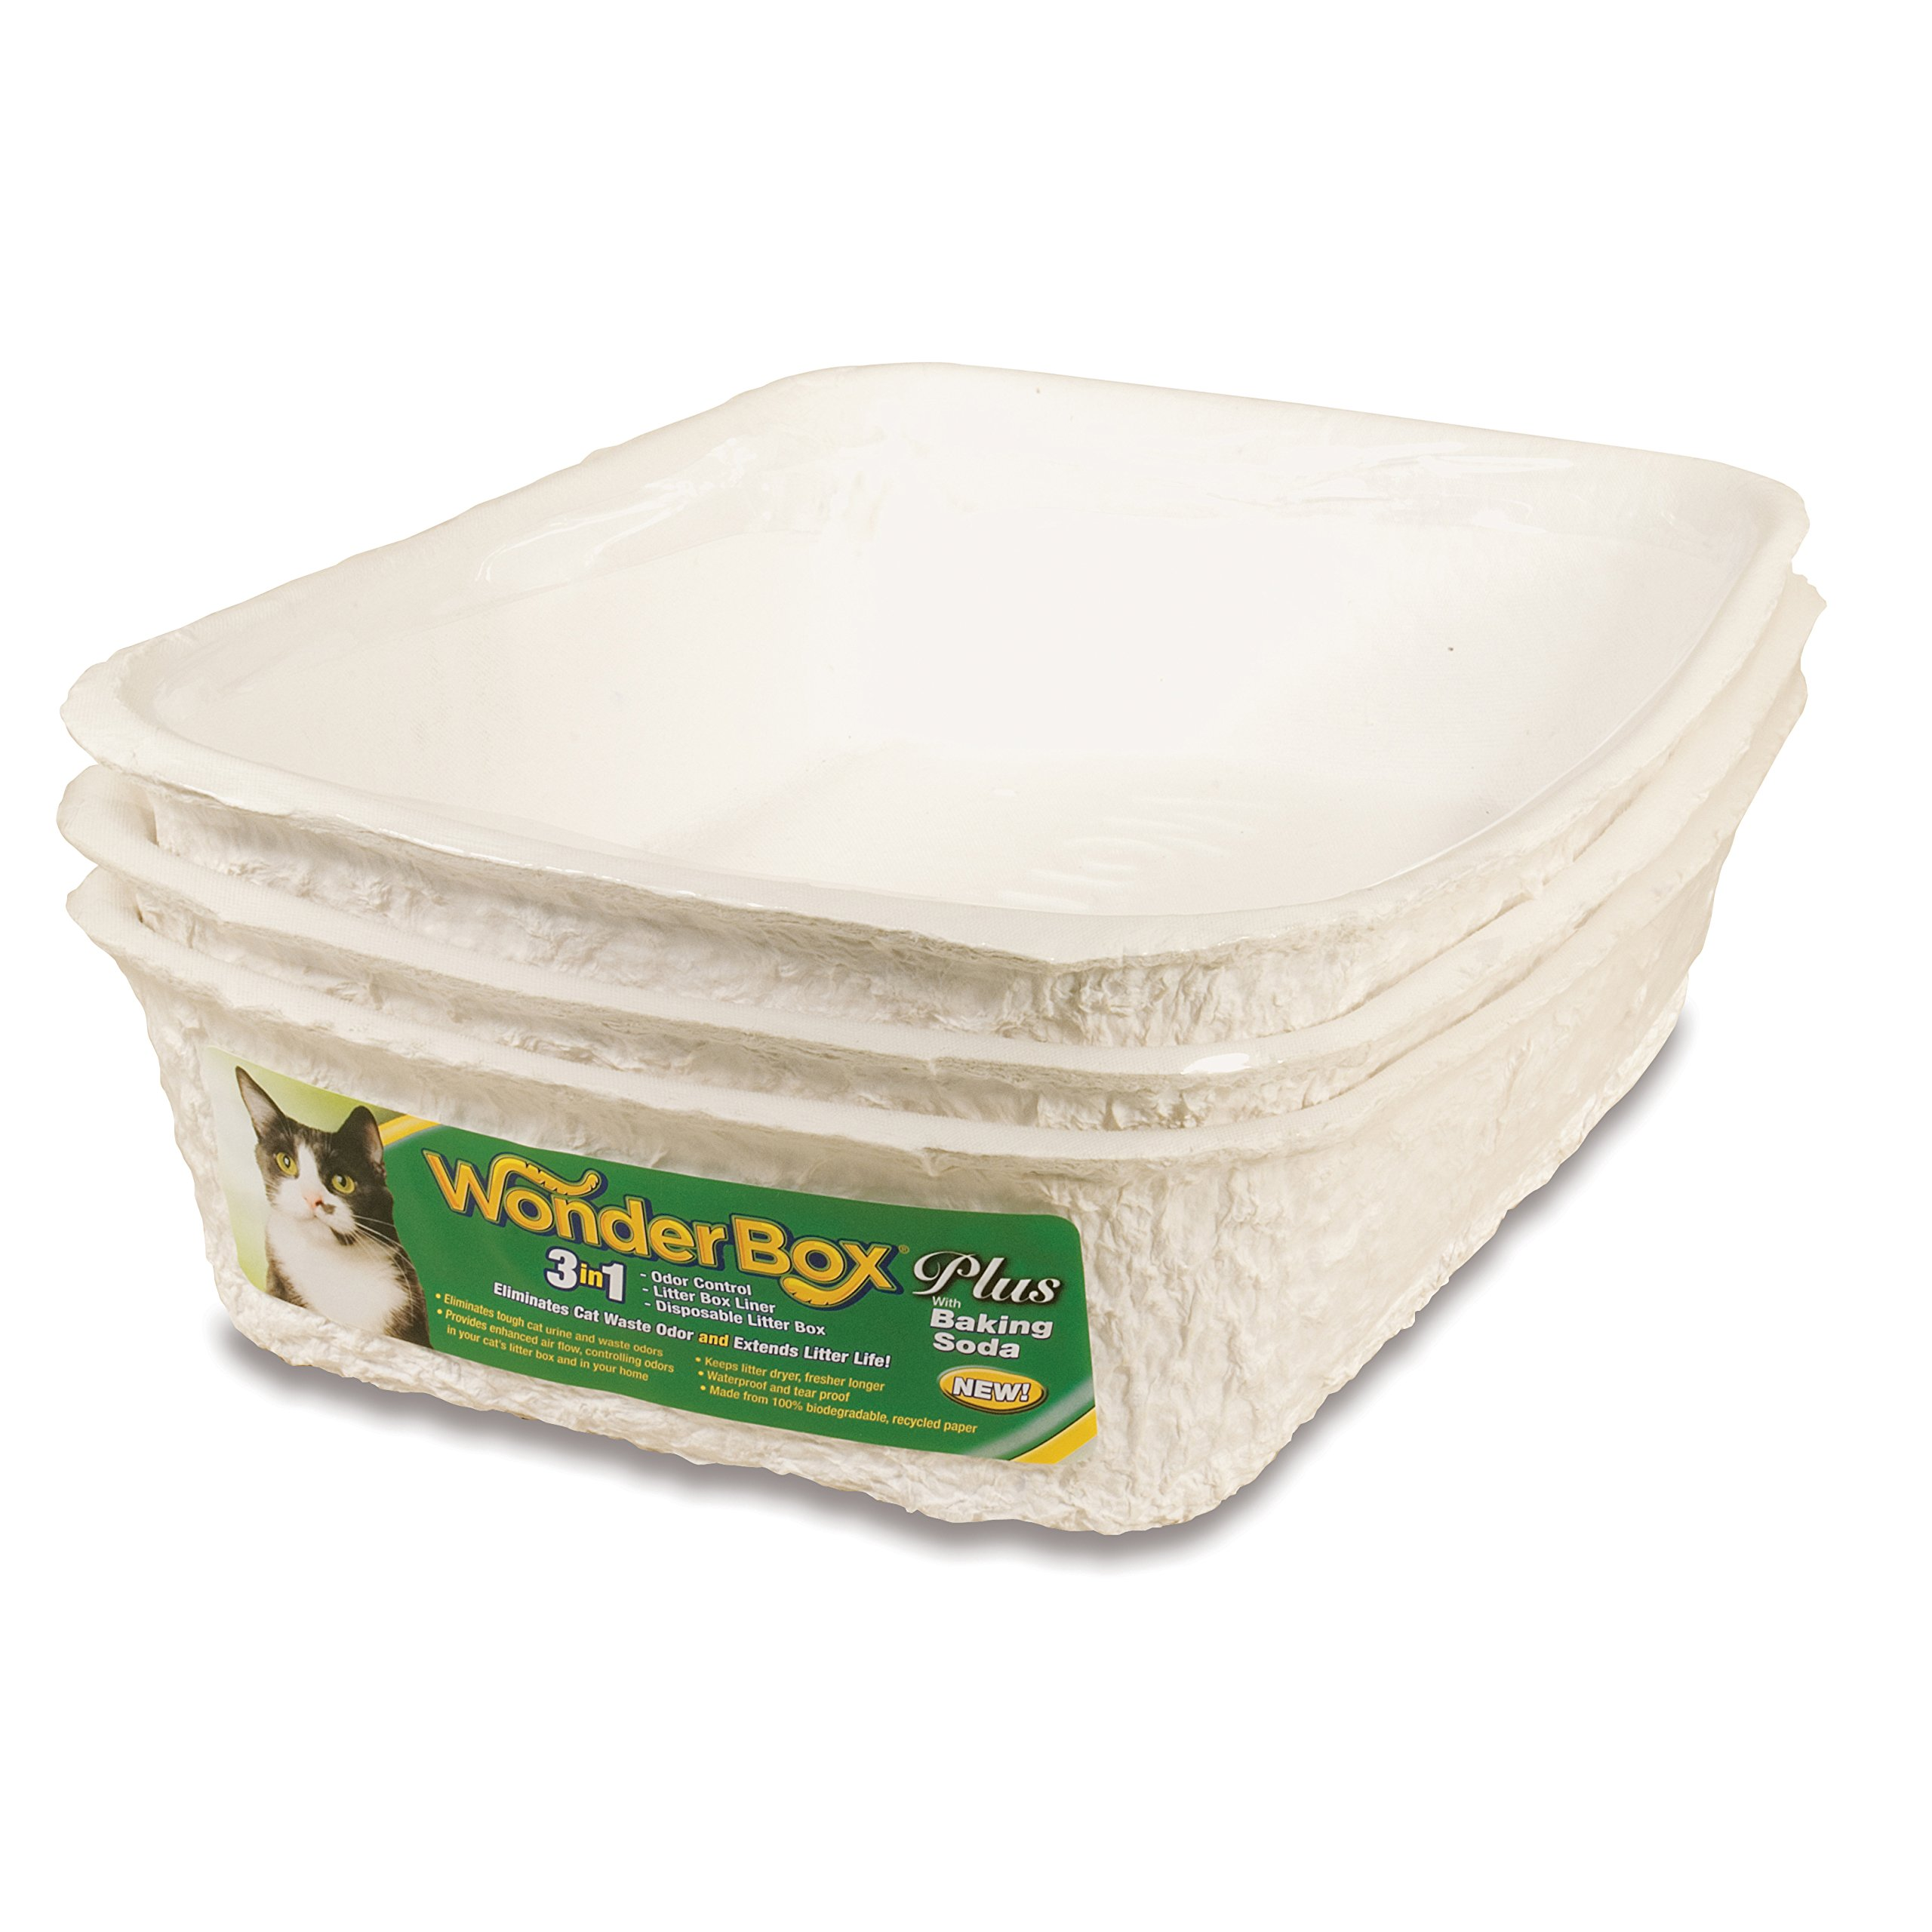 Kitty's WonderBox Disposable Litter Box, Medium, 3-Count by Kitty's Wonderbox